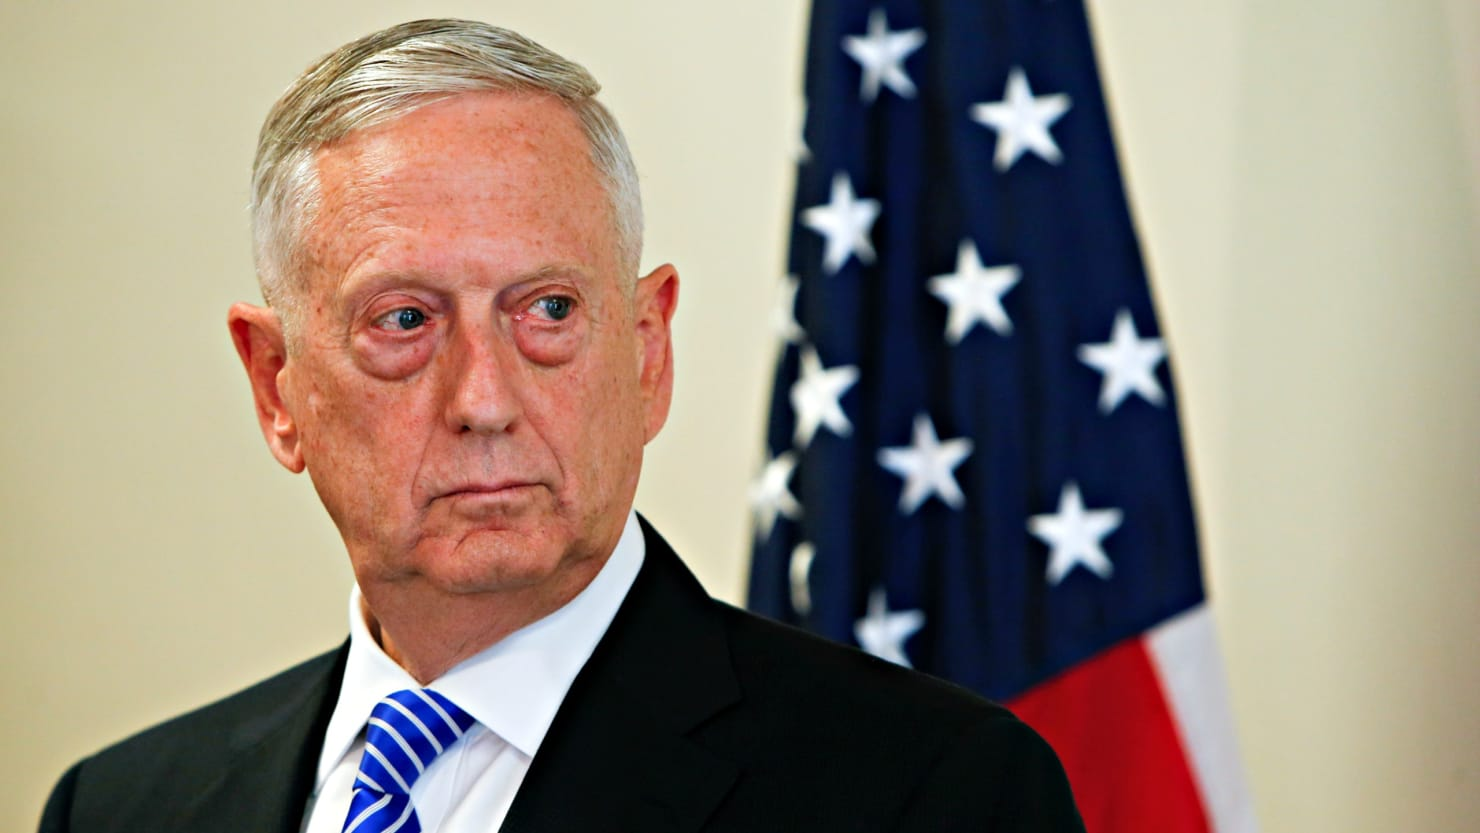 Sec. Mattis: Stay in Iran deal